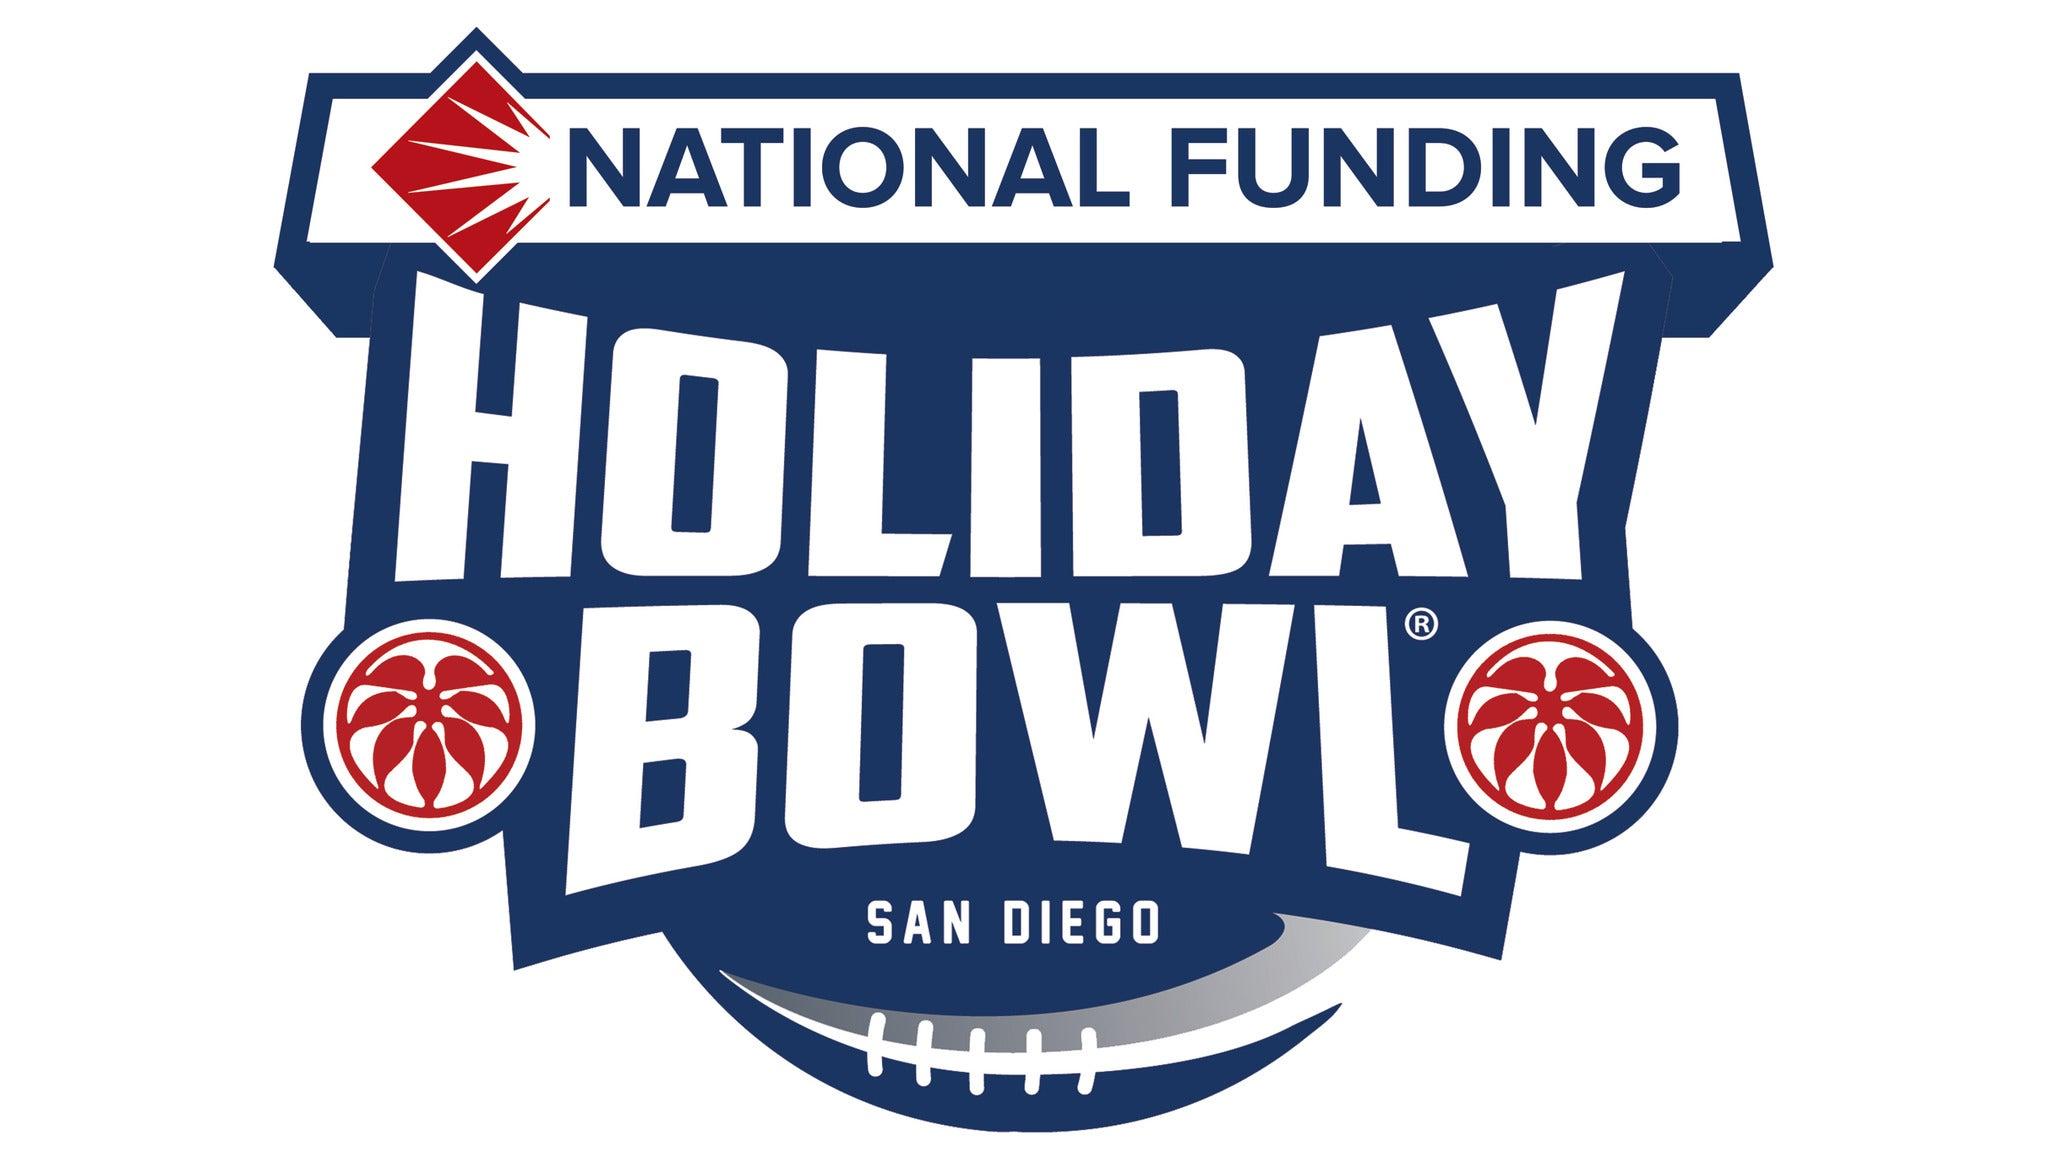 Holiday Bowl at Qualcomm Stadium